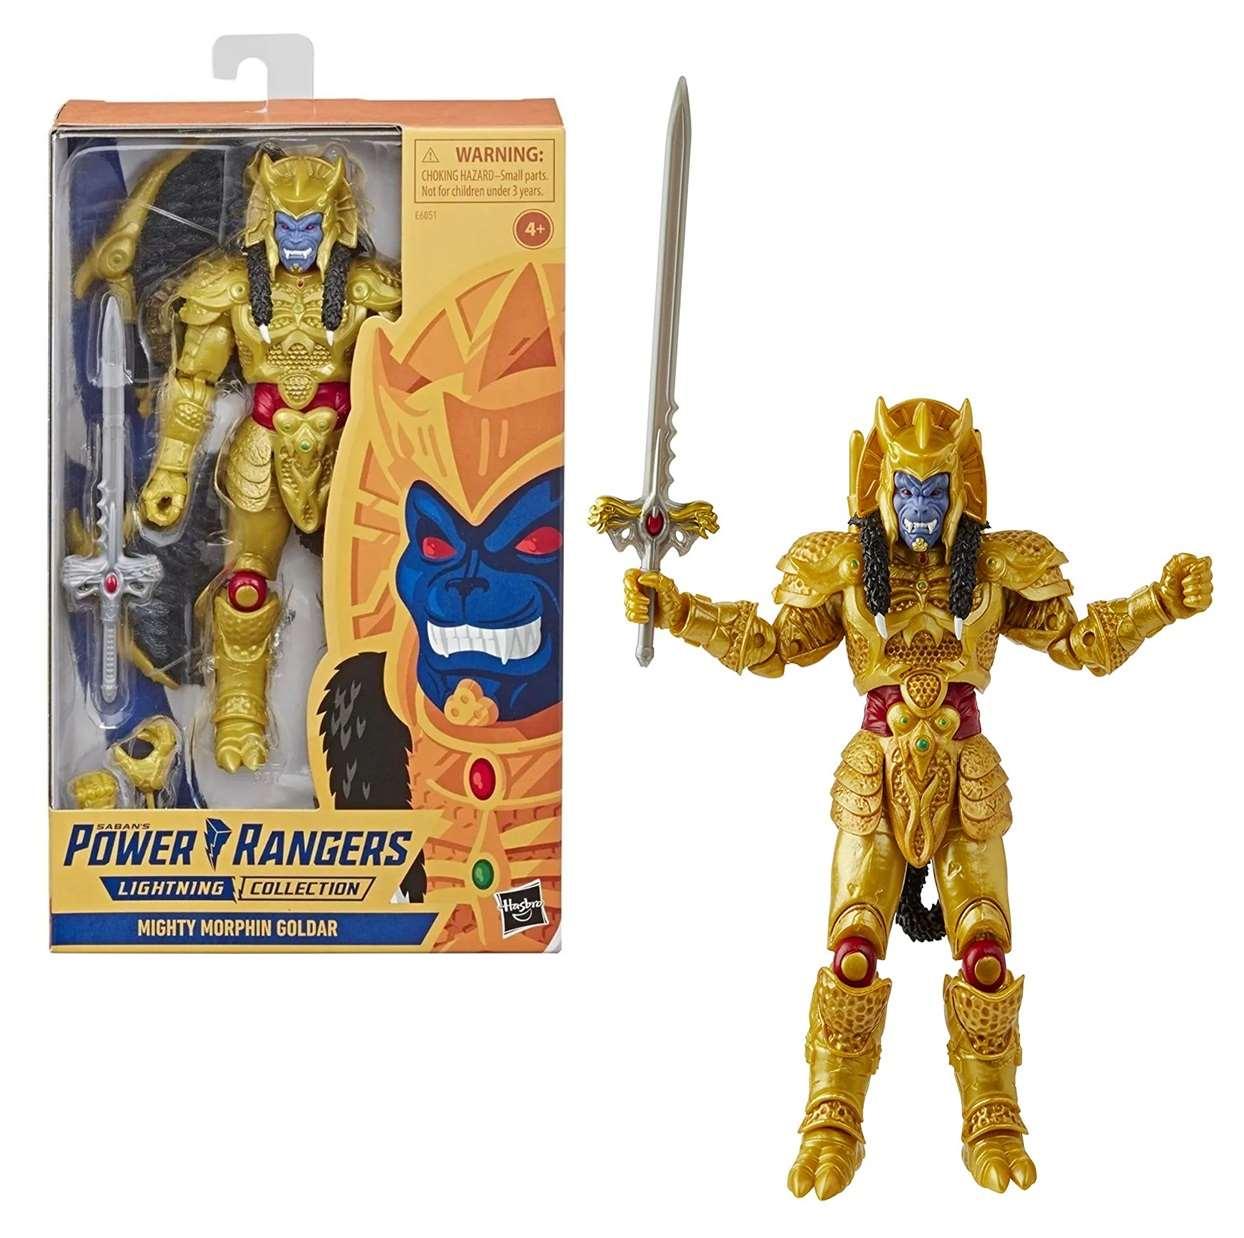 Power Rangers Lighting Collection Mighty Morphin Goldar